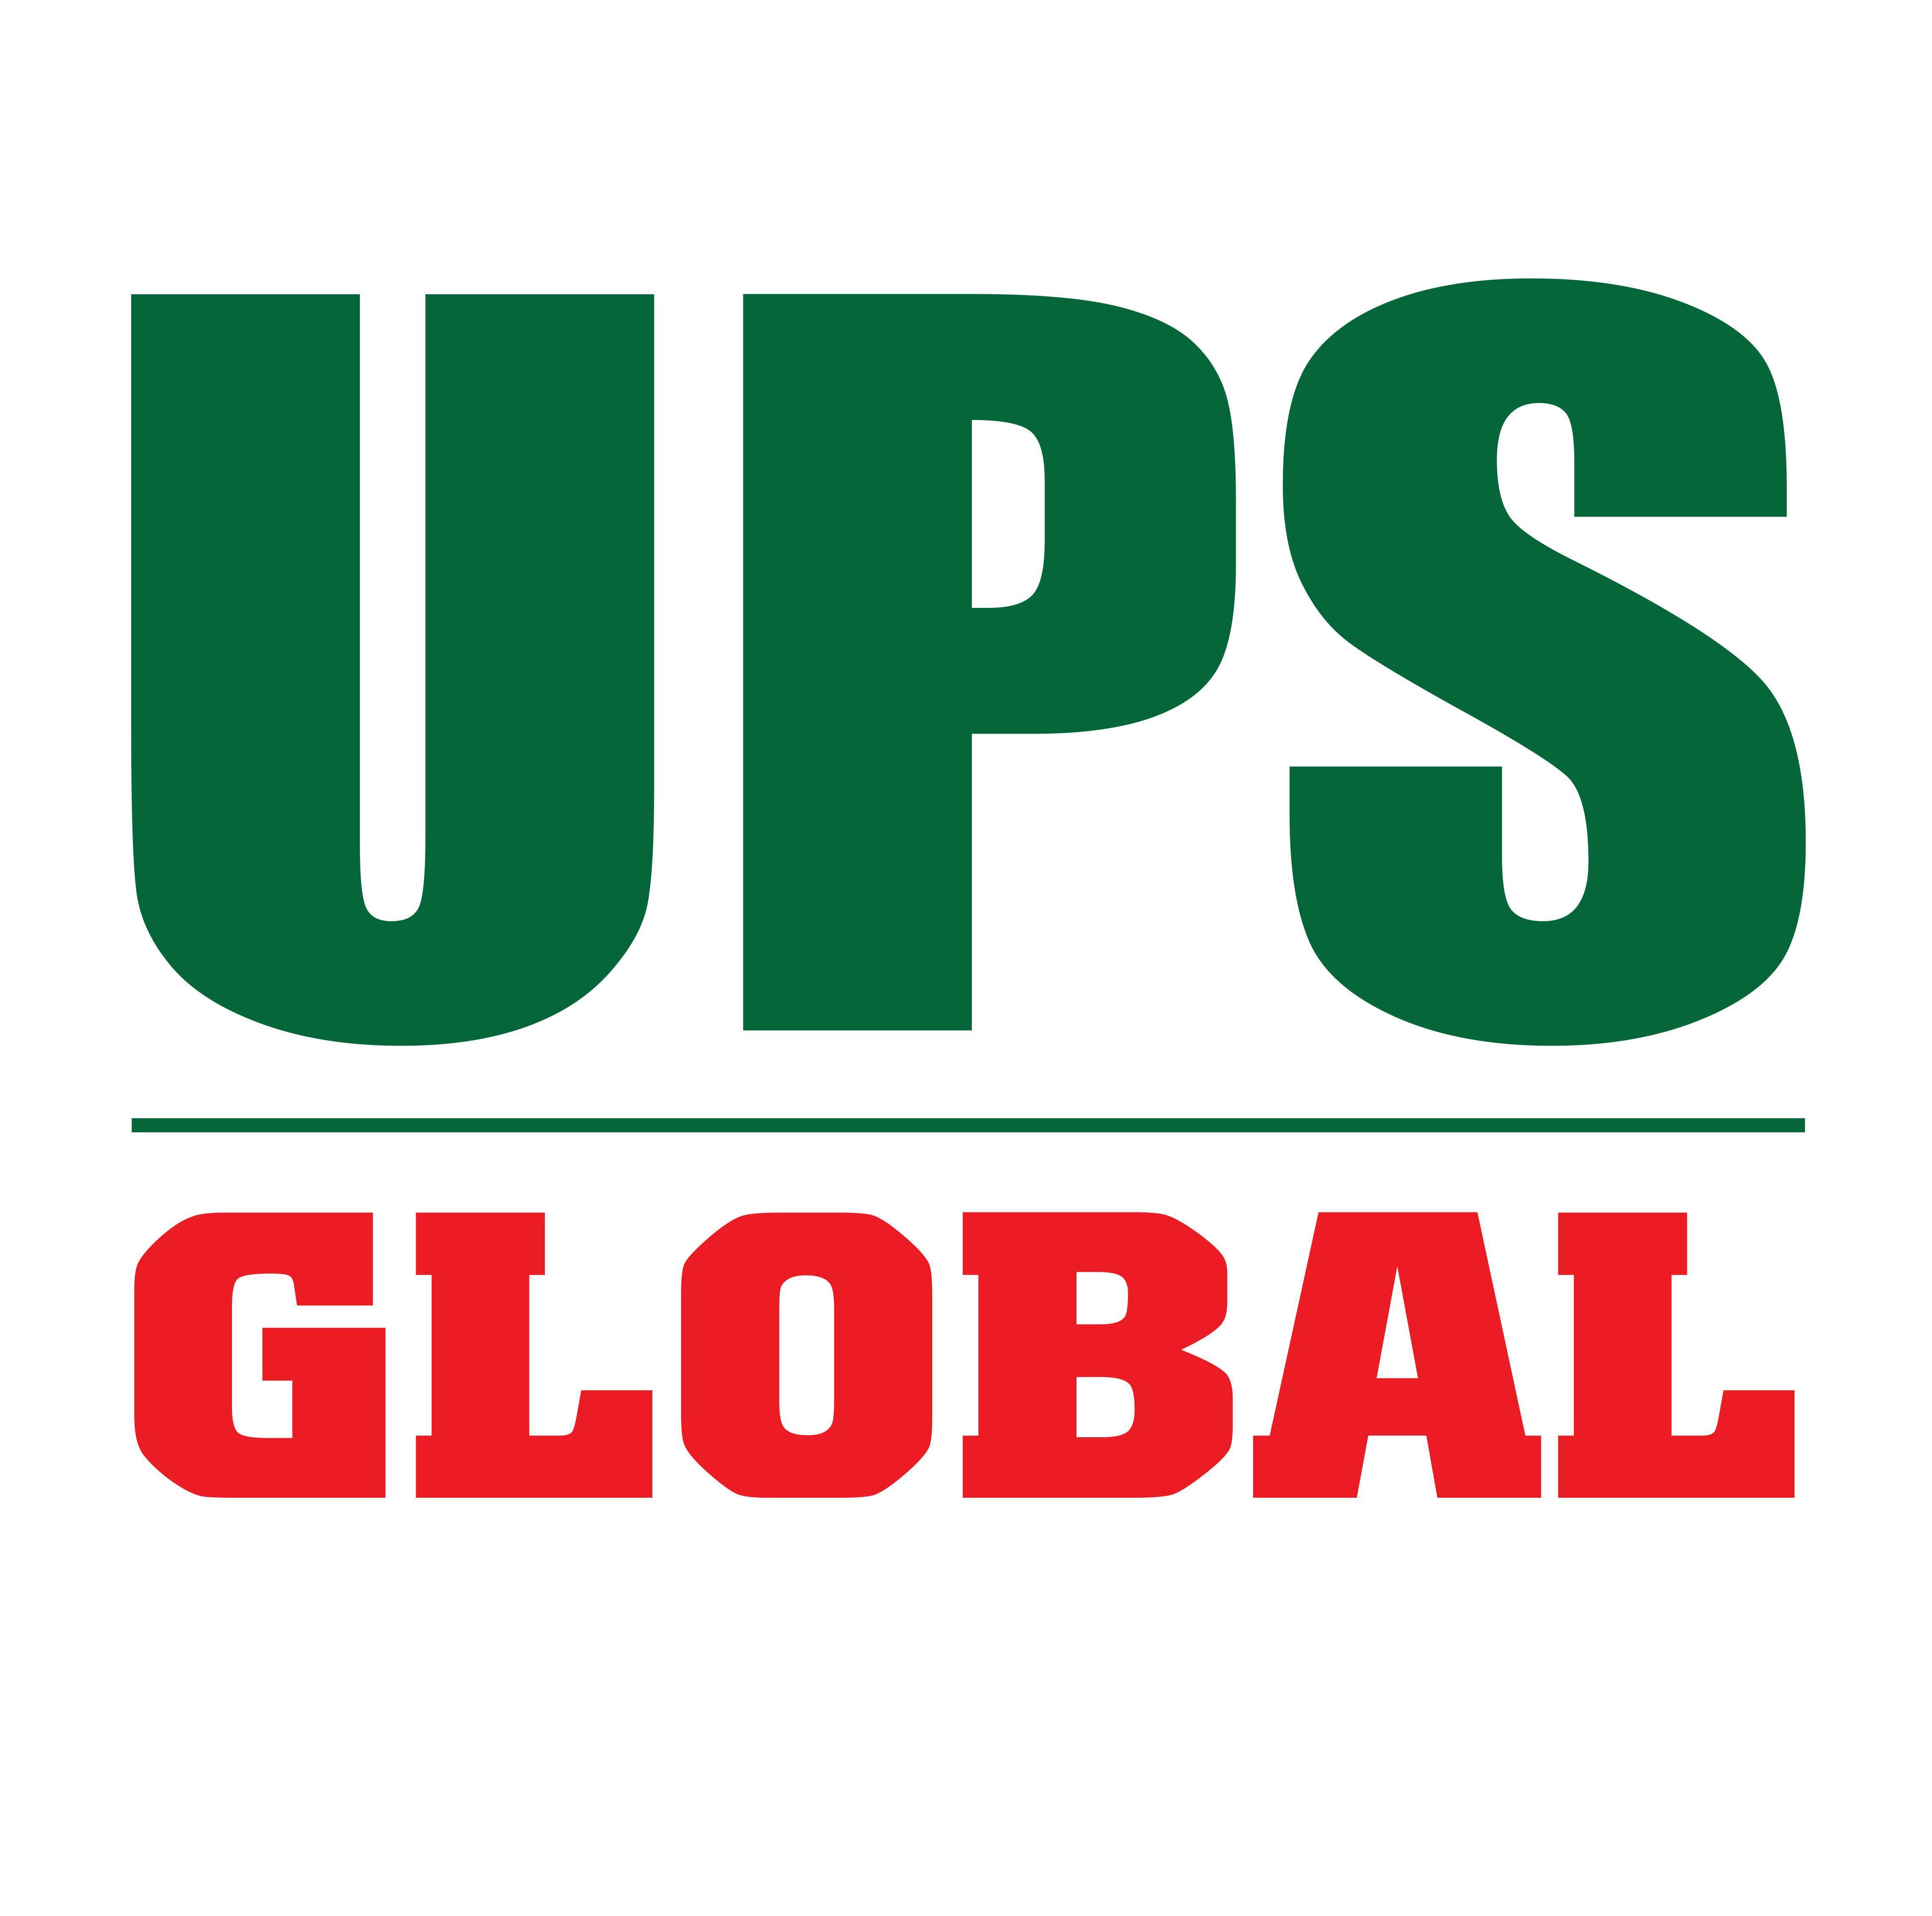 UNITED PARTNERS SOLUTIONS (VIET NAM) CORPORATION